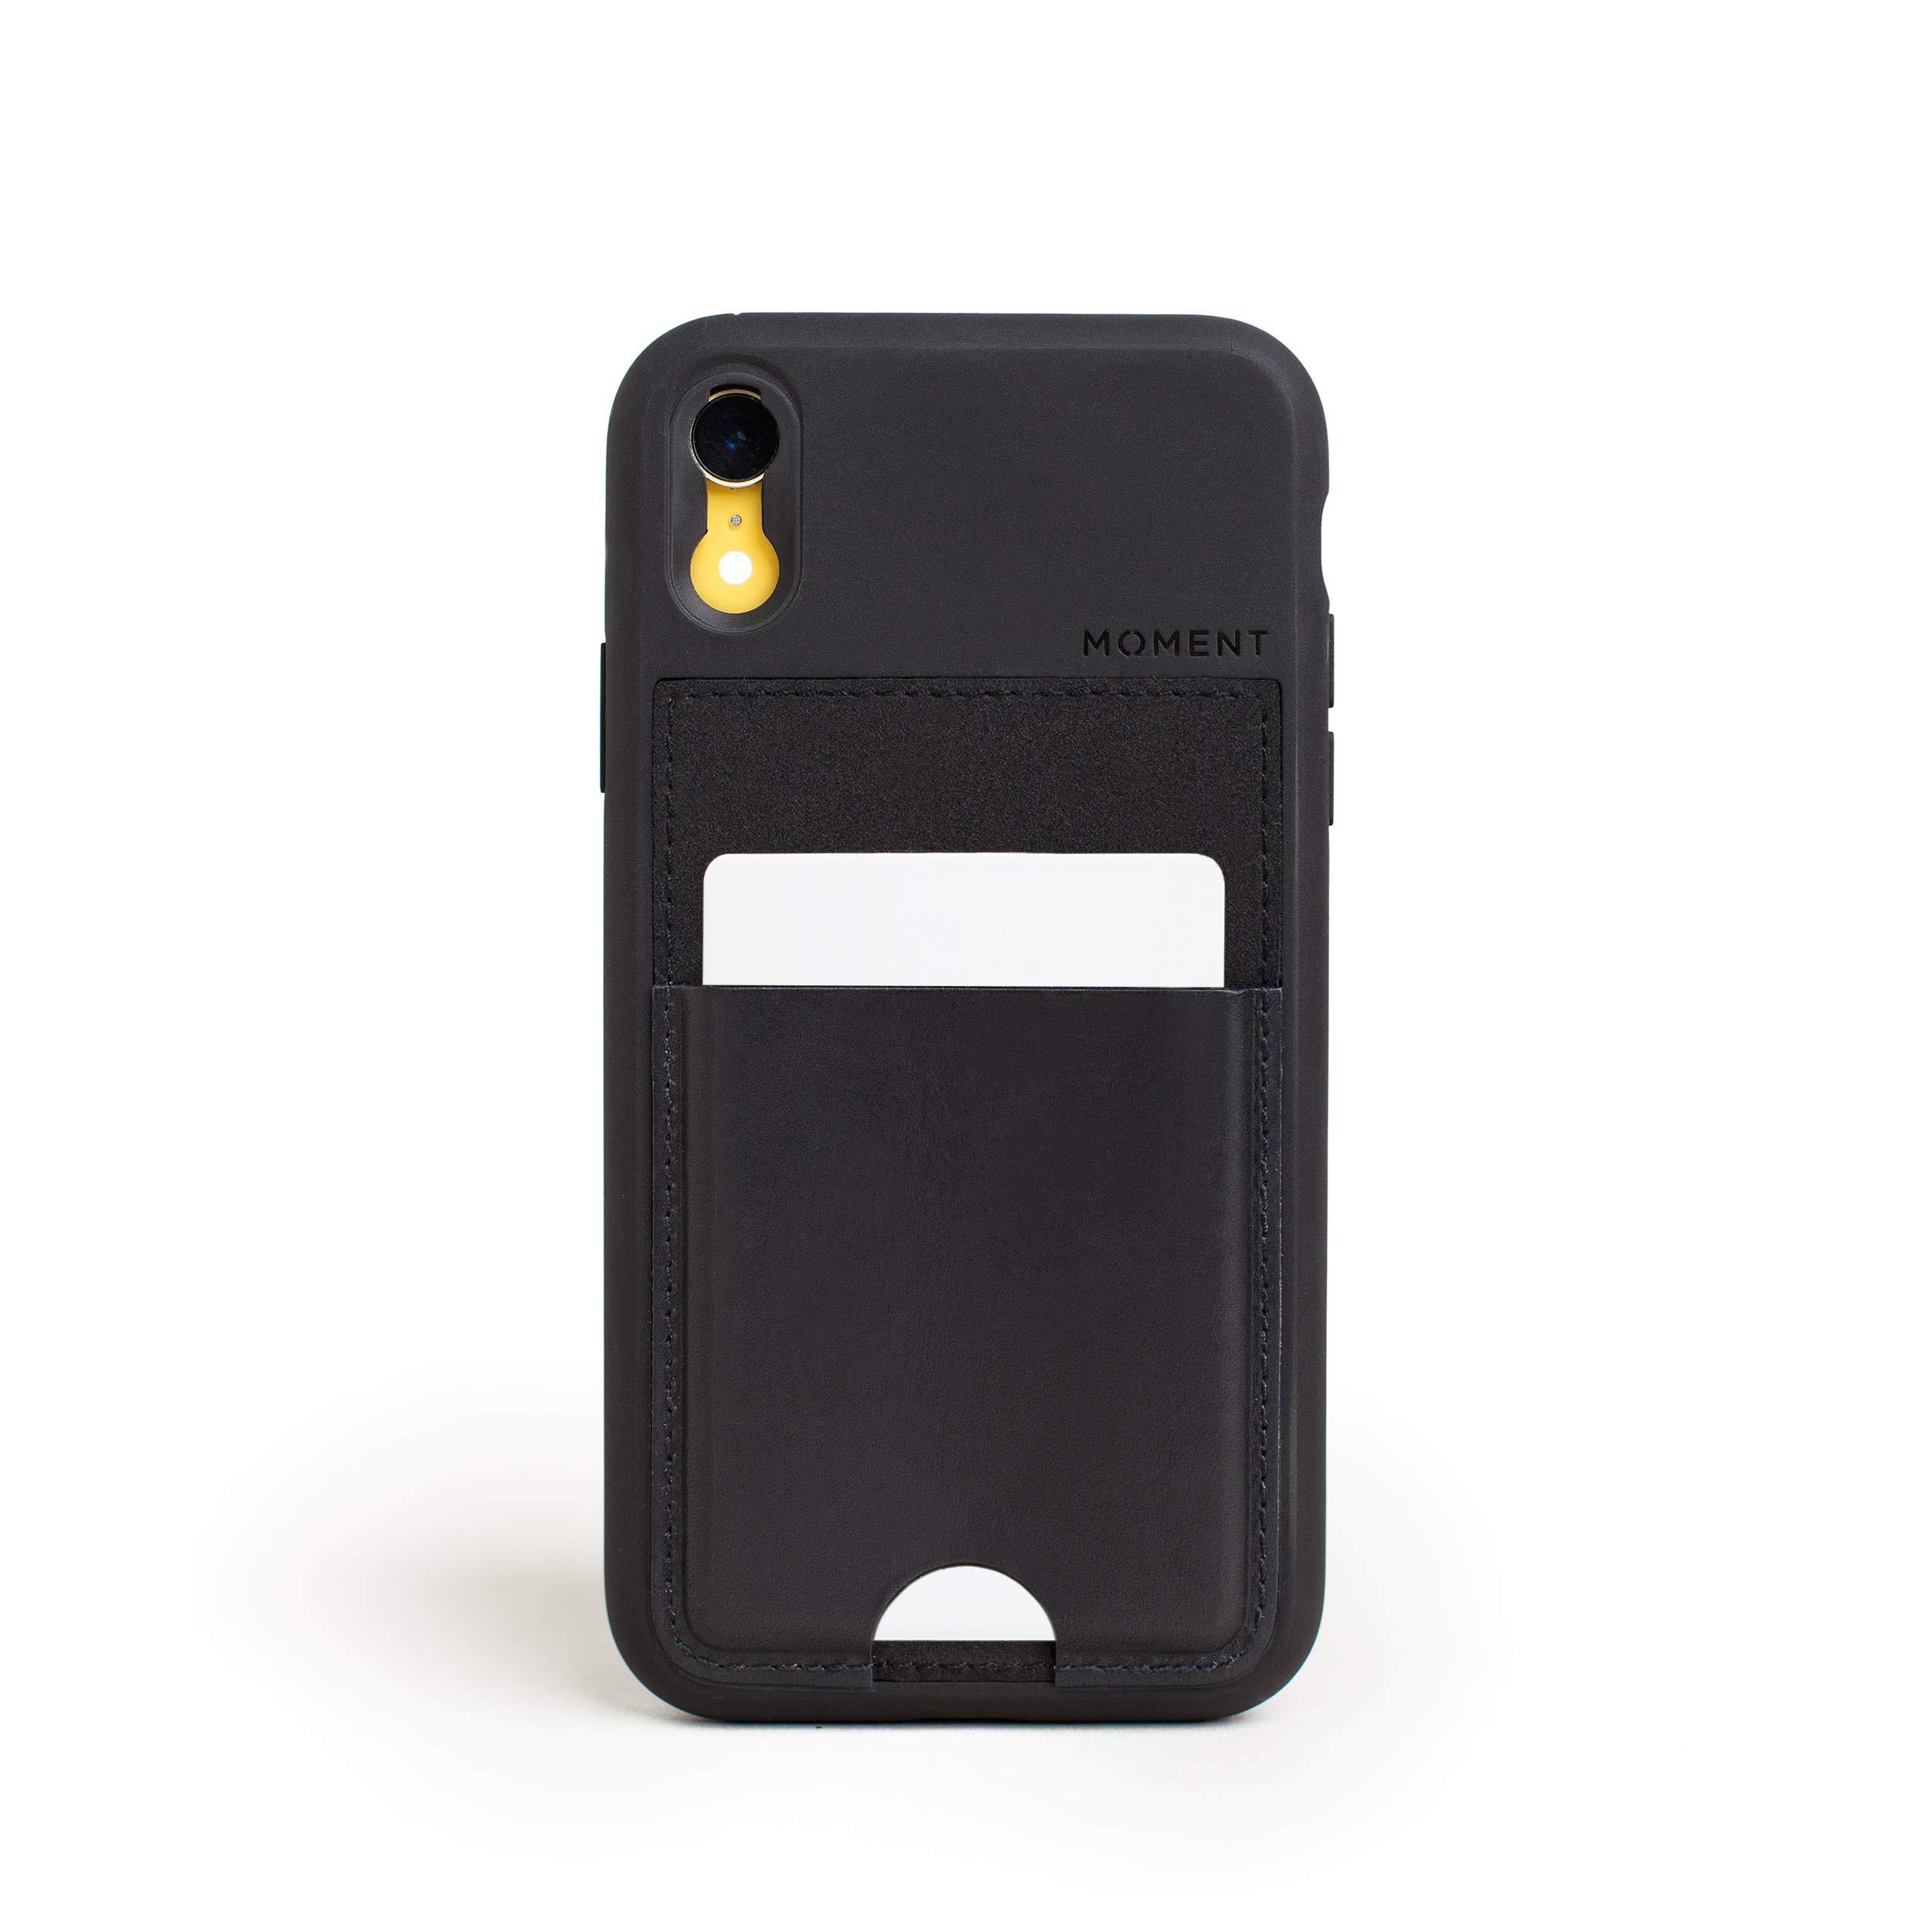 ویکالا · خرید  اصل اورجینال · خرید از آمازون · iPhone XR Wallet Case || Moment Photo Case in Black Leather - Thin, Protective, Wrist Strap Friendly Wallet case for Camera Lovers. wekala · ویکالا